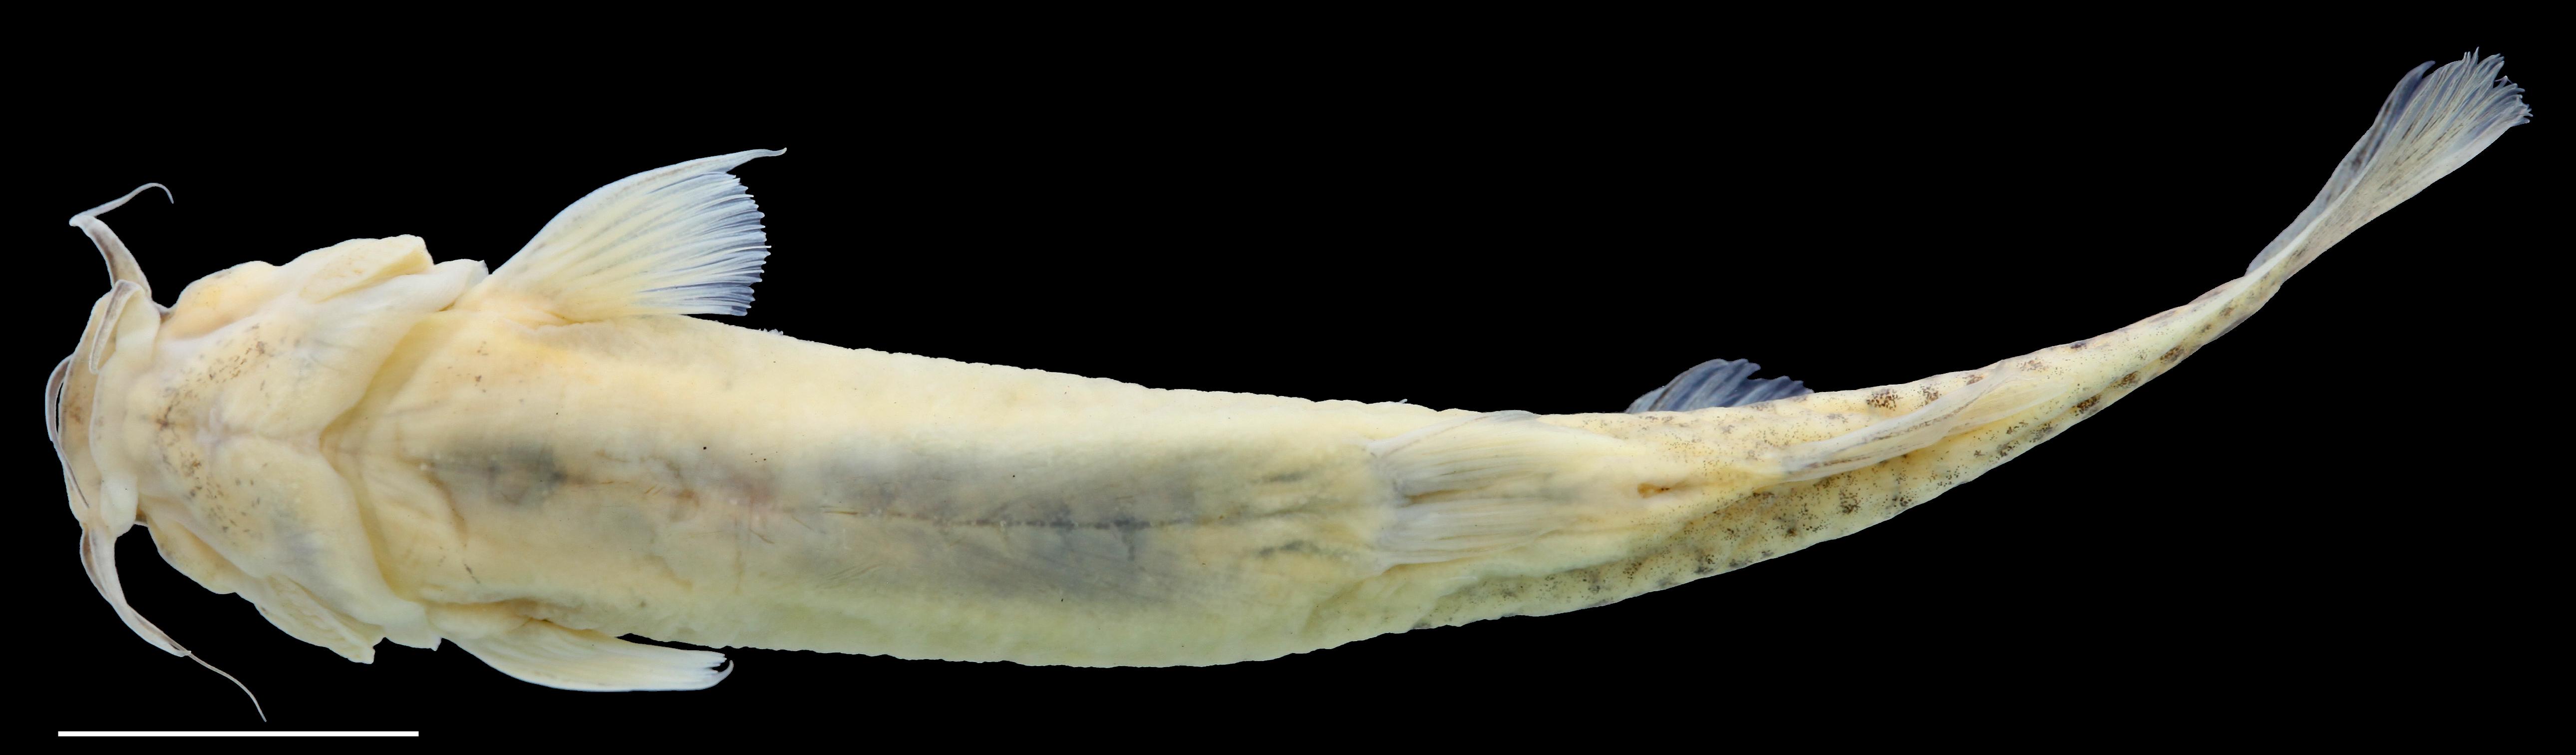 Paratype of <em>Trichomycterus torcoromaensis</em>, IAvH-P-13422_Ventral, 62.2 mm SL (scale bar = 1 cm). Photograph by C. DoNascimiento